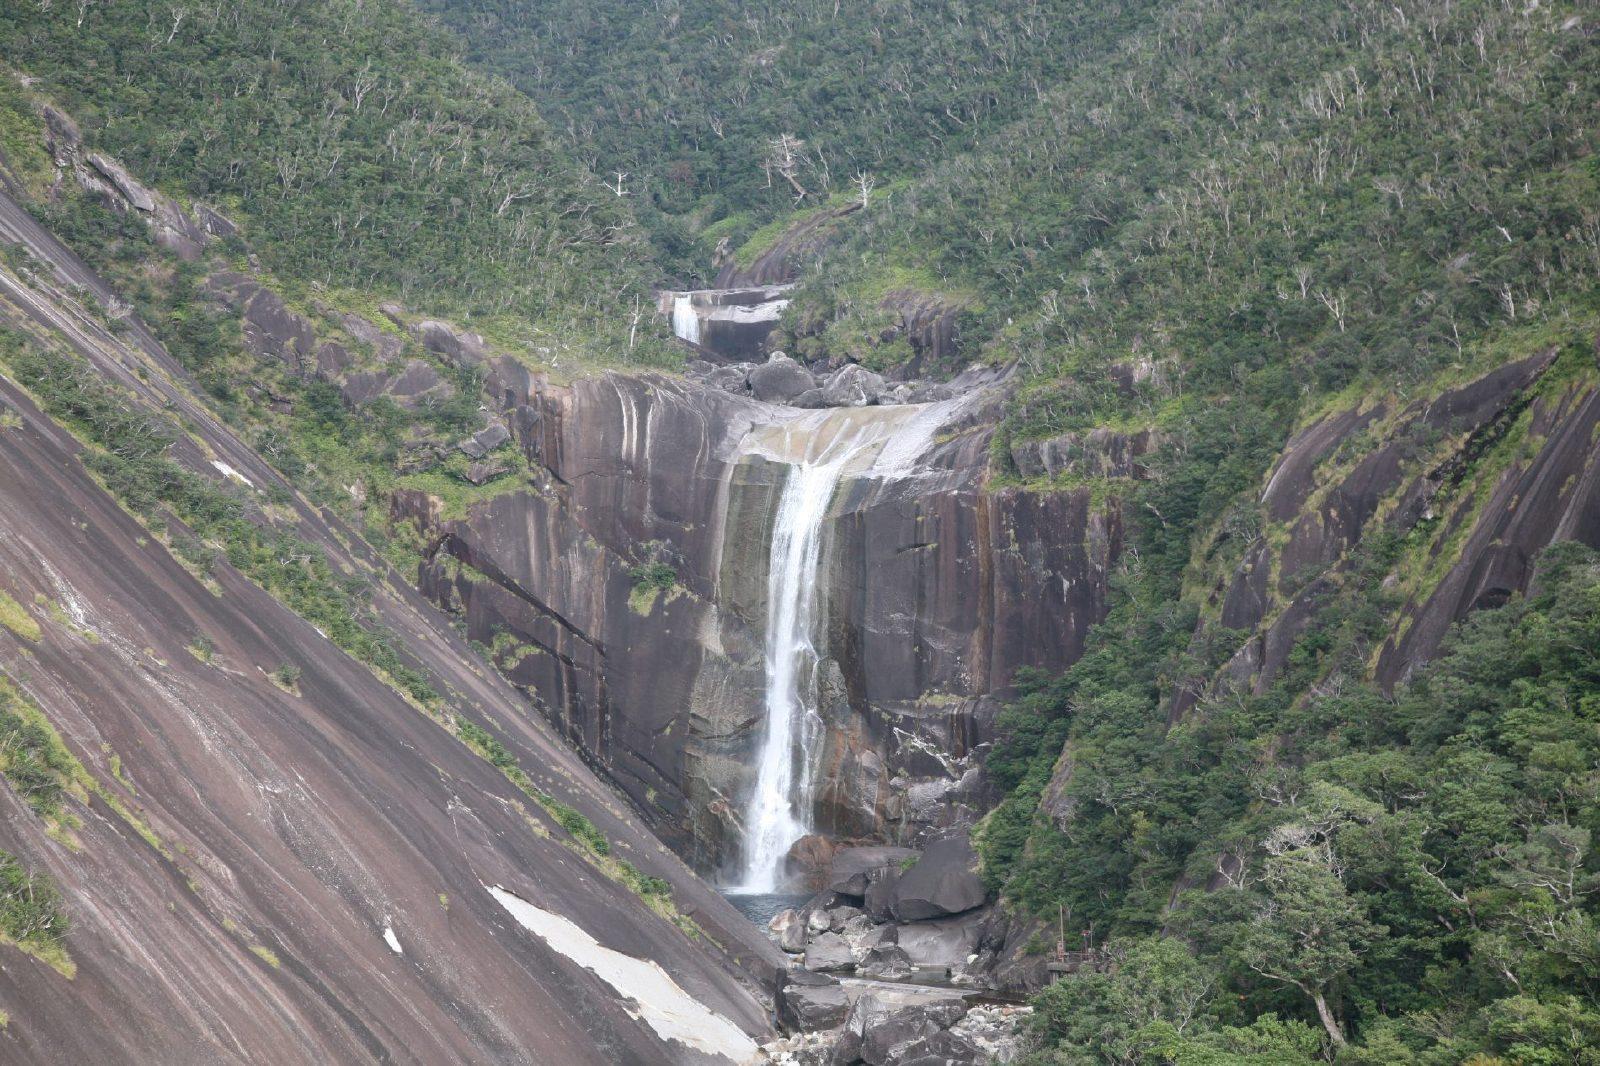 Senpiro falls